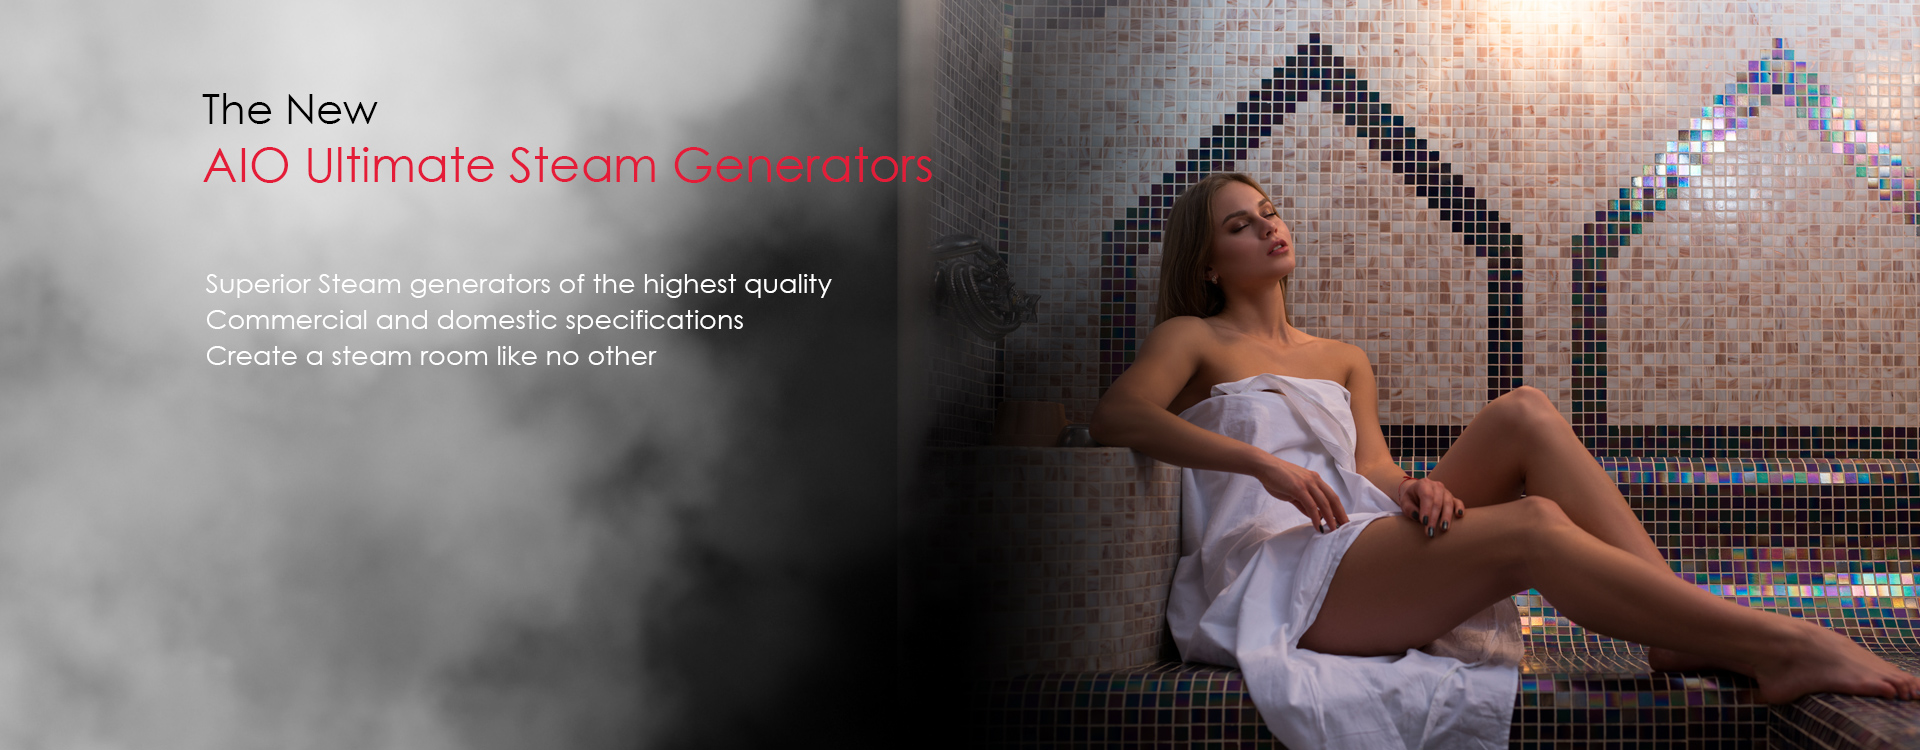 All-In-One Steam Generators